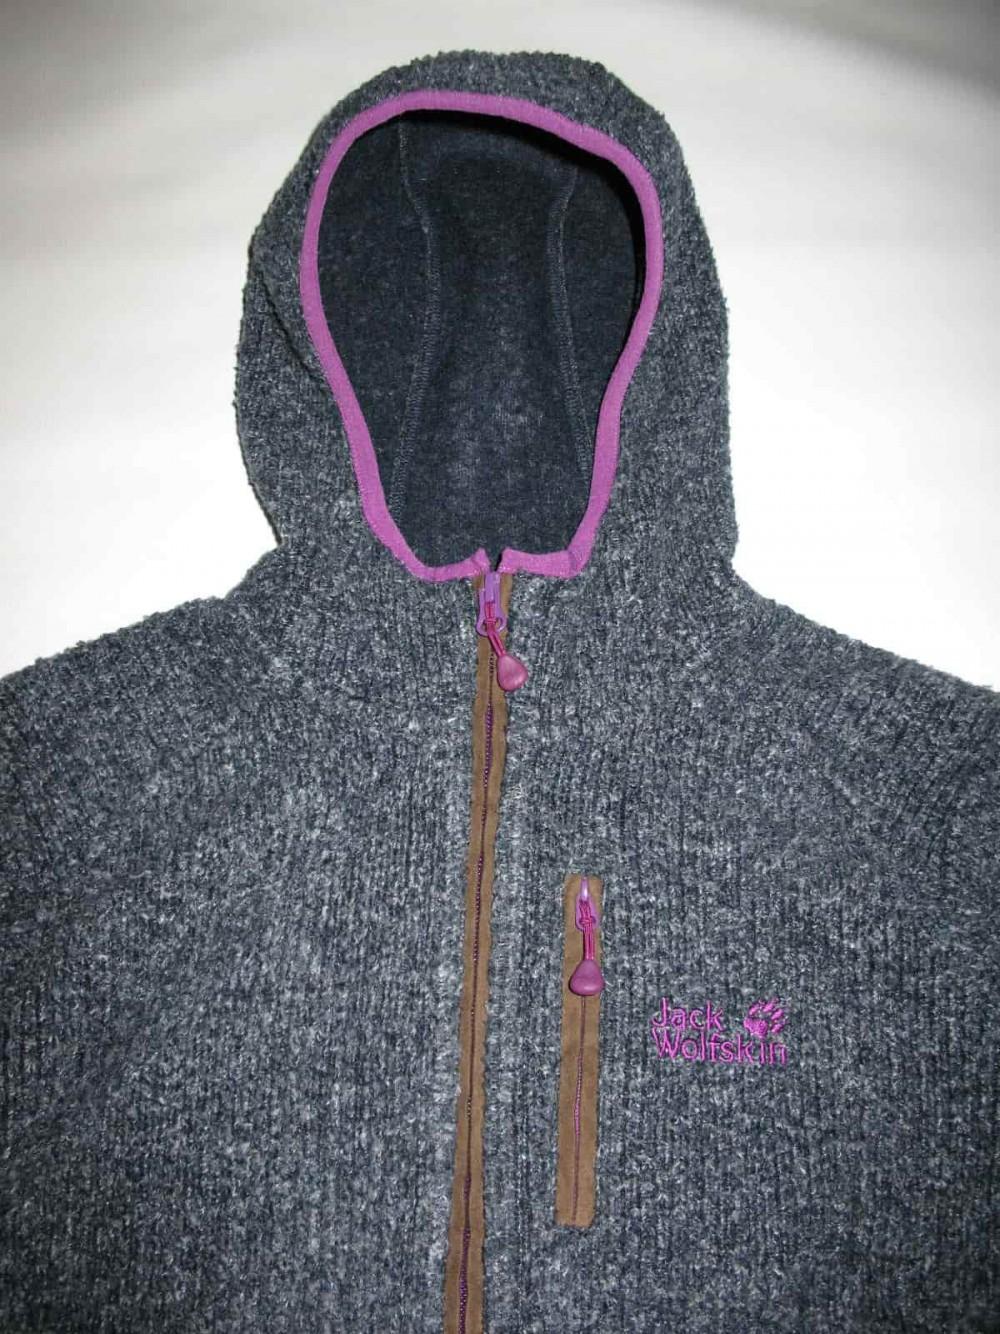 Кофта JACK WOLFSKIN milton fleece hoodie lady (размер 40-M/L) - 5